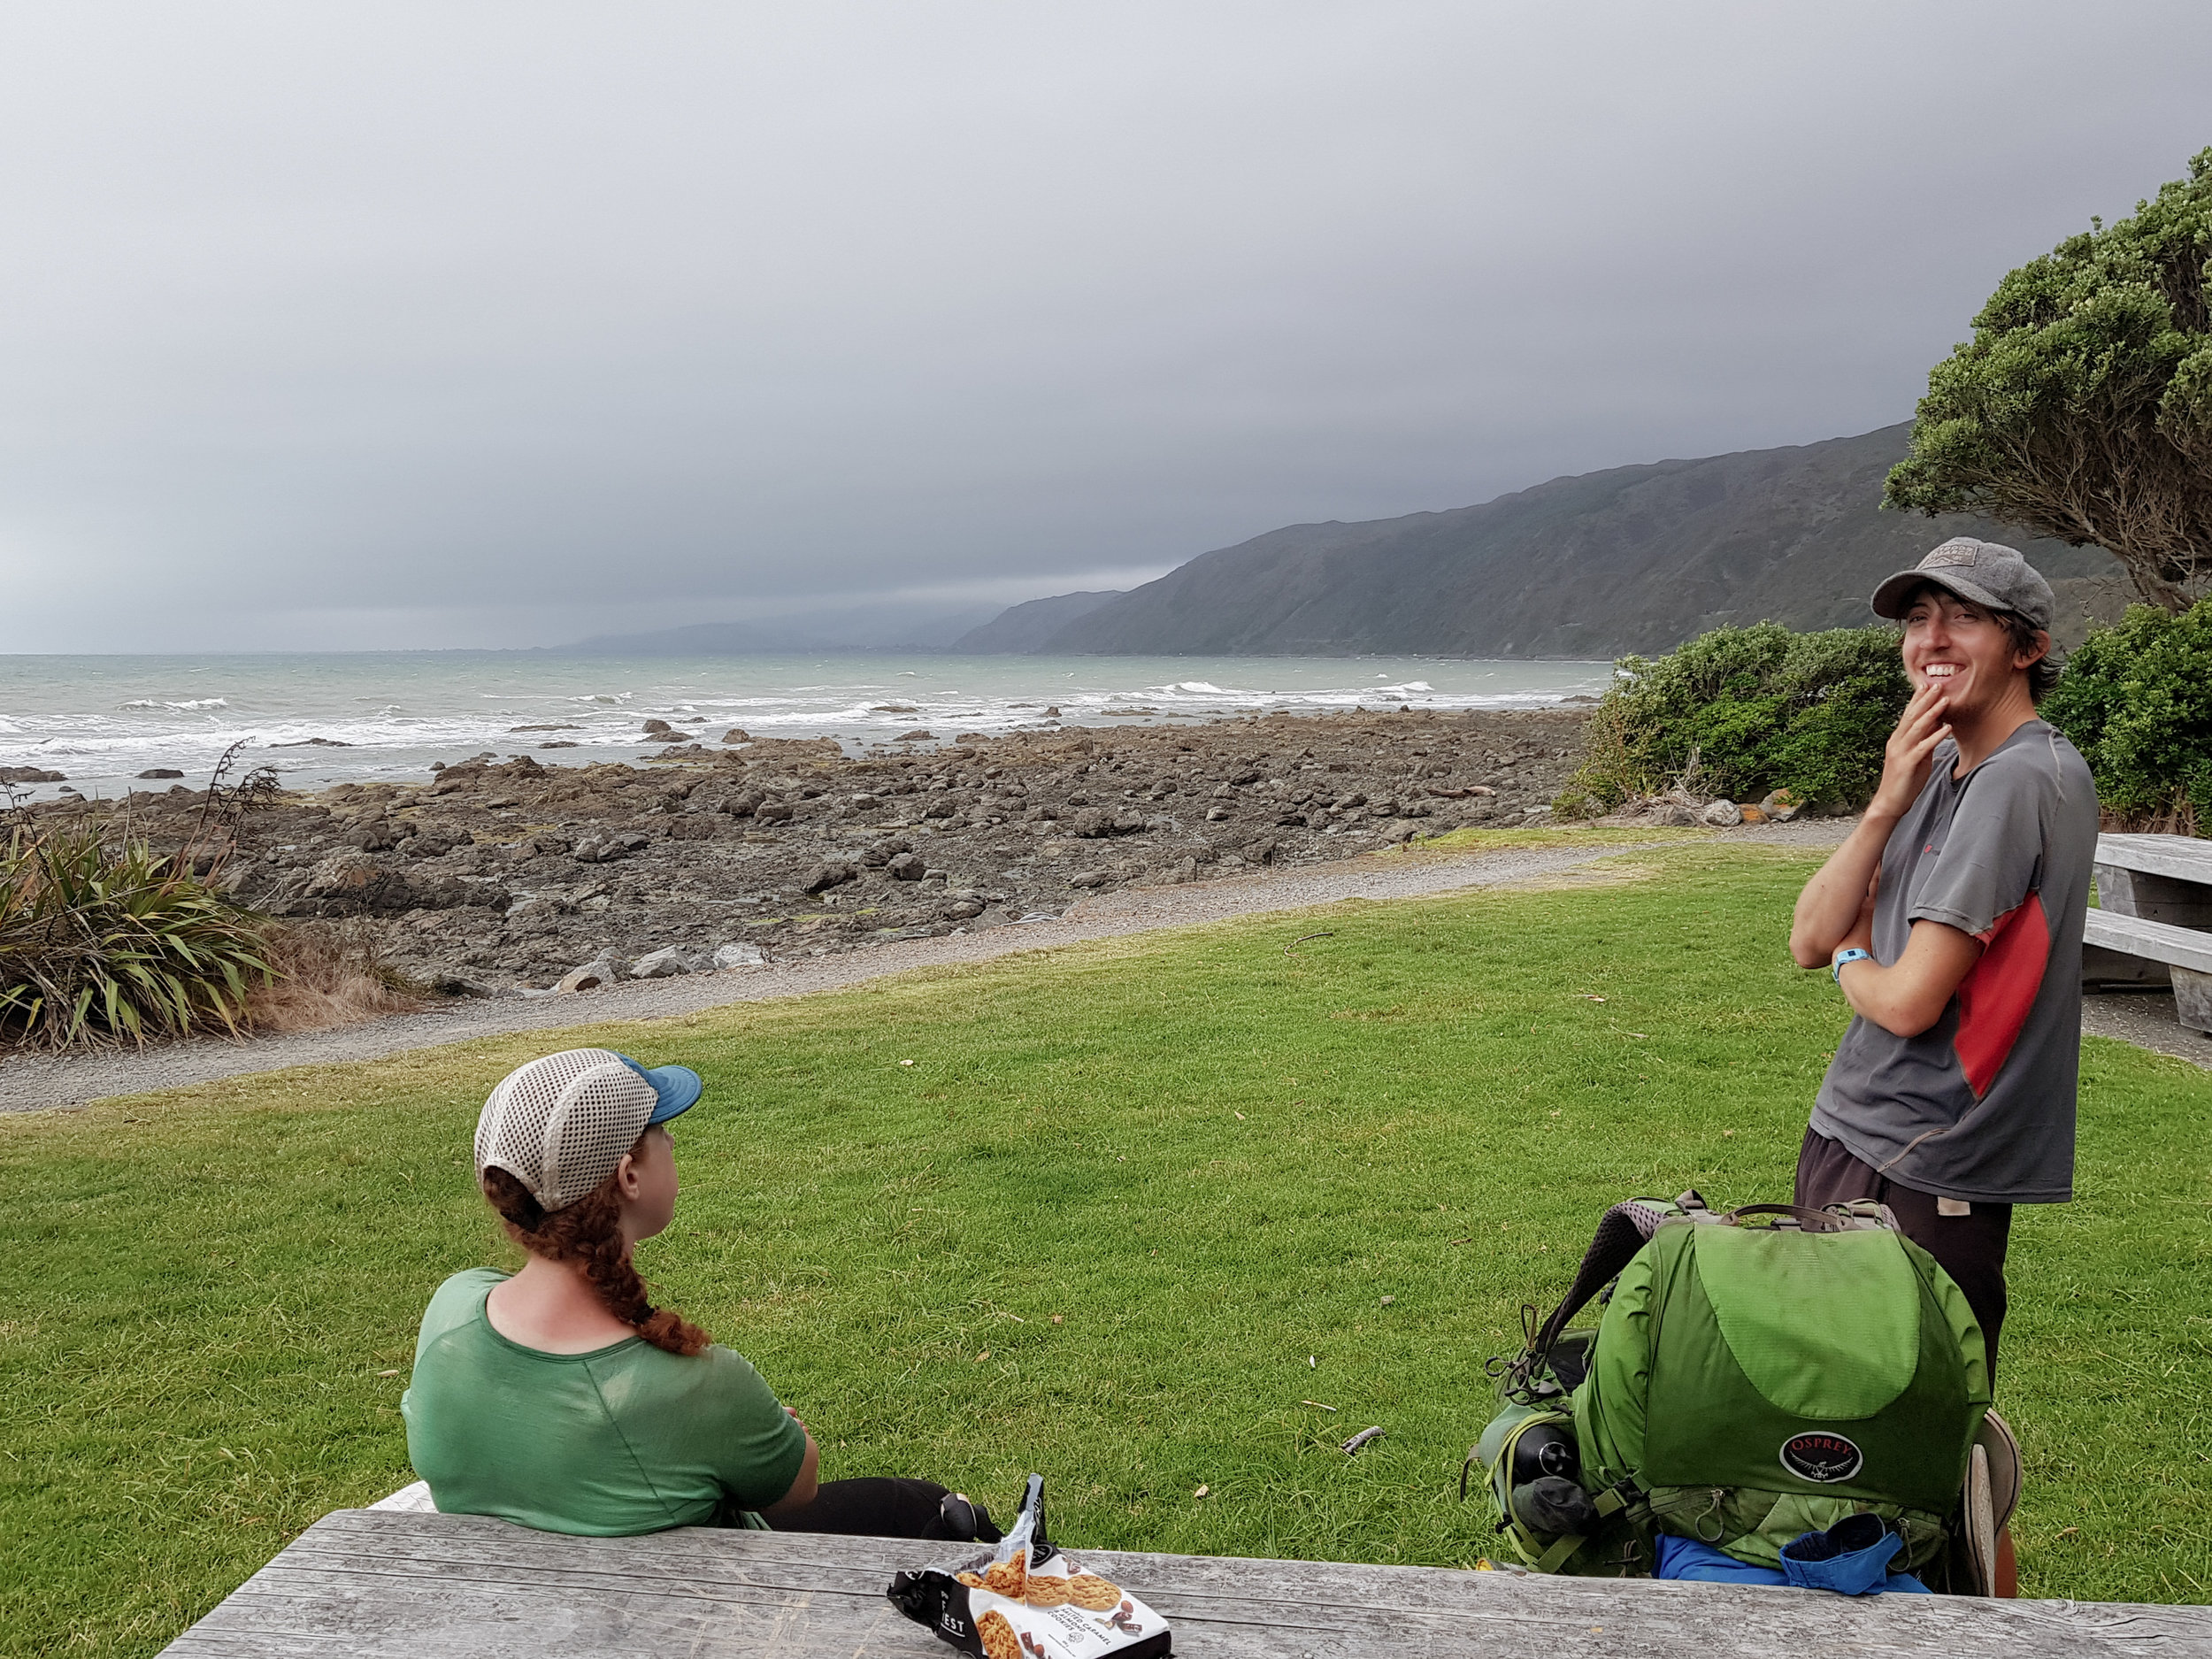 Beachfront camping with beautiful hiker trash  photo/ Jonathan